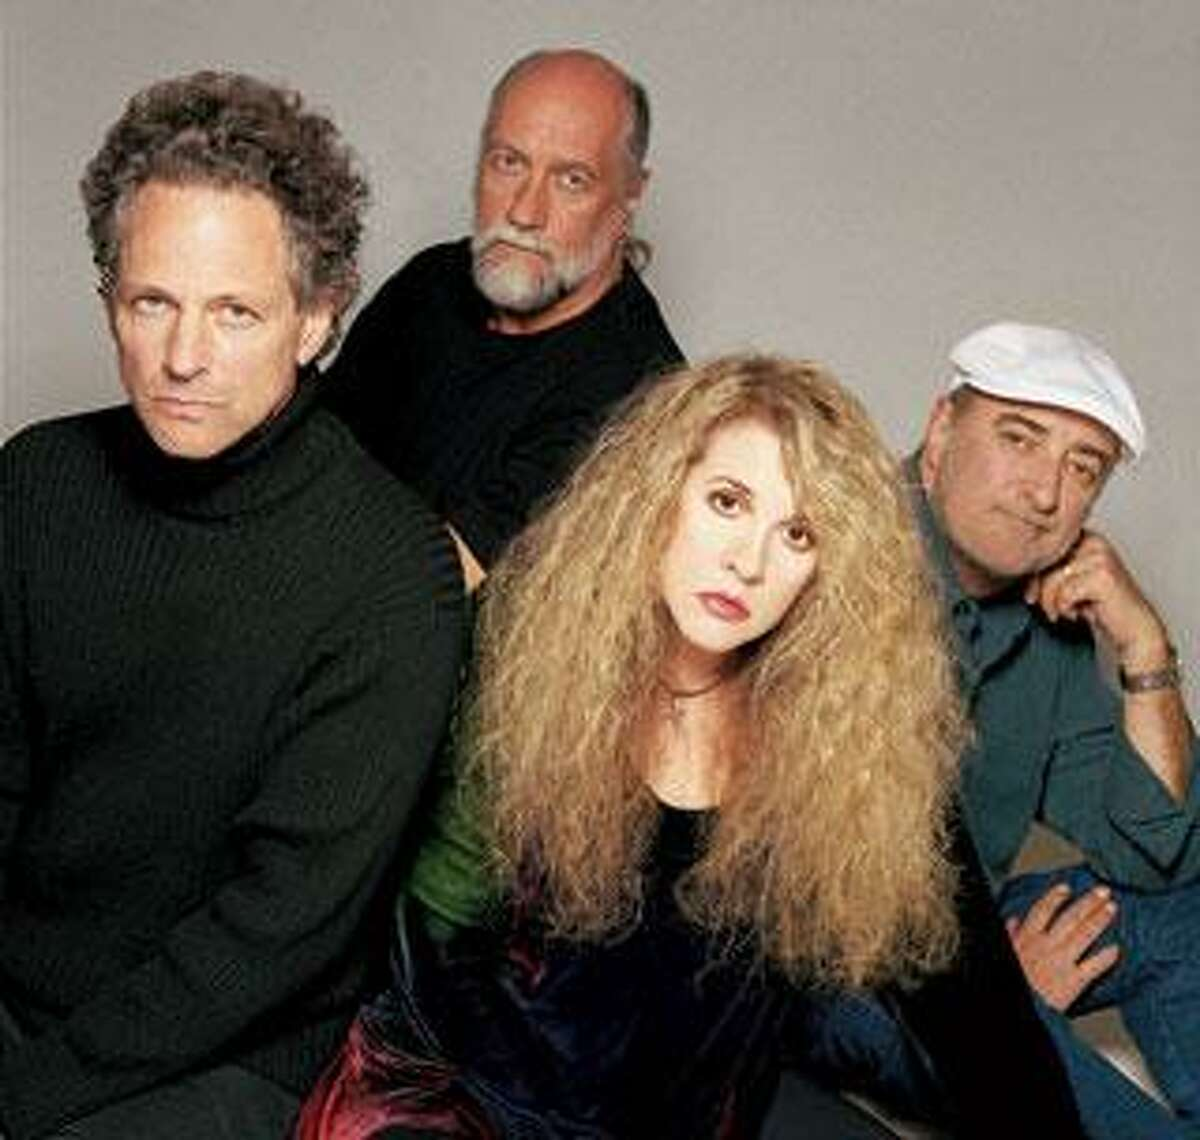 The legendary pop band Fleetwood Mac brings its big bag of hits to Mohegan Saturday. (Warner Bros.)